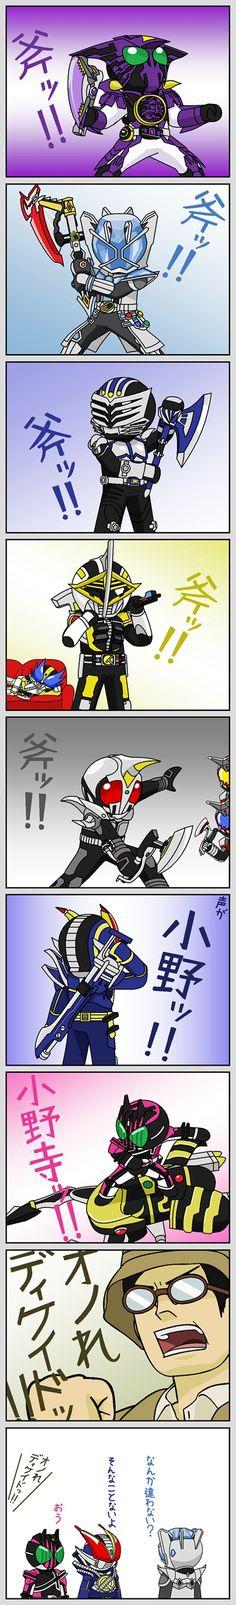 Kamen Rider Wizard, Kamen Rider Ooo, Kamen Rider Decade, Kamen Rider Series, Kamen Rider Ryuki, Alice Cullen, Pokemon Charizard, Marvel Entertainment, Marvel Funny